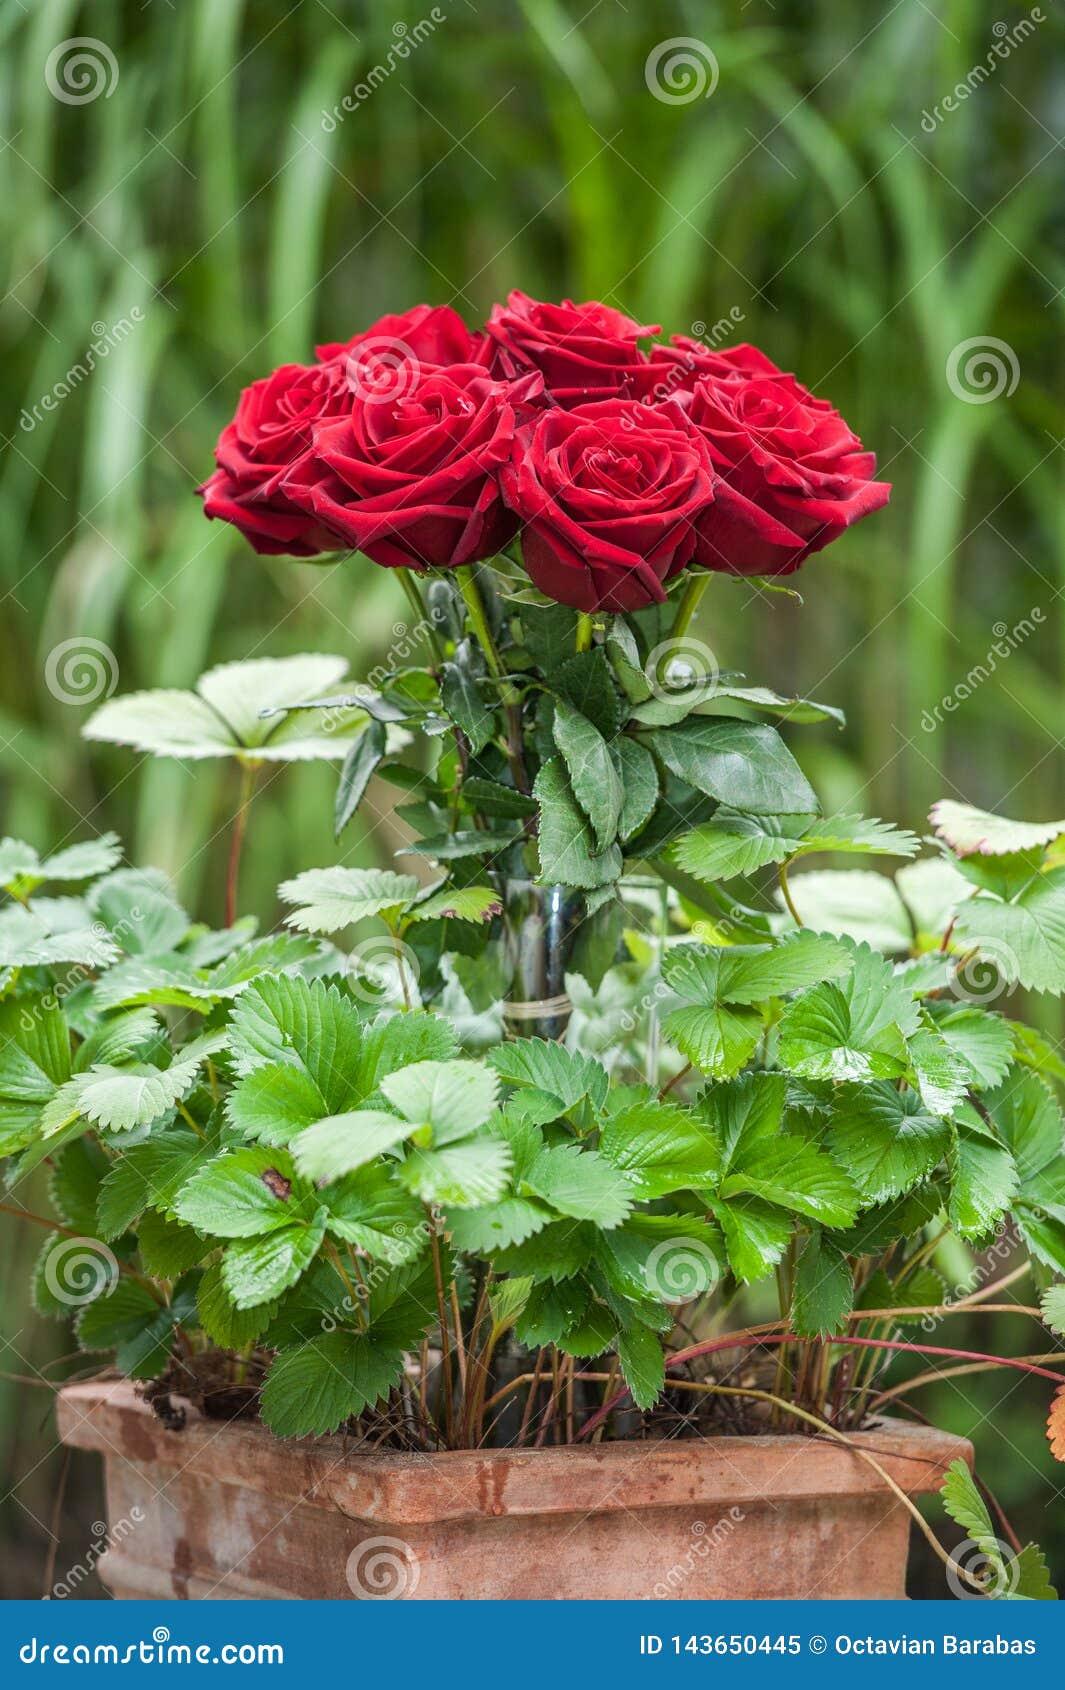 Red roses in flower pot